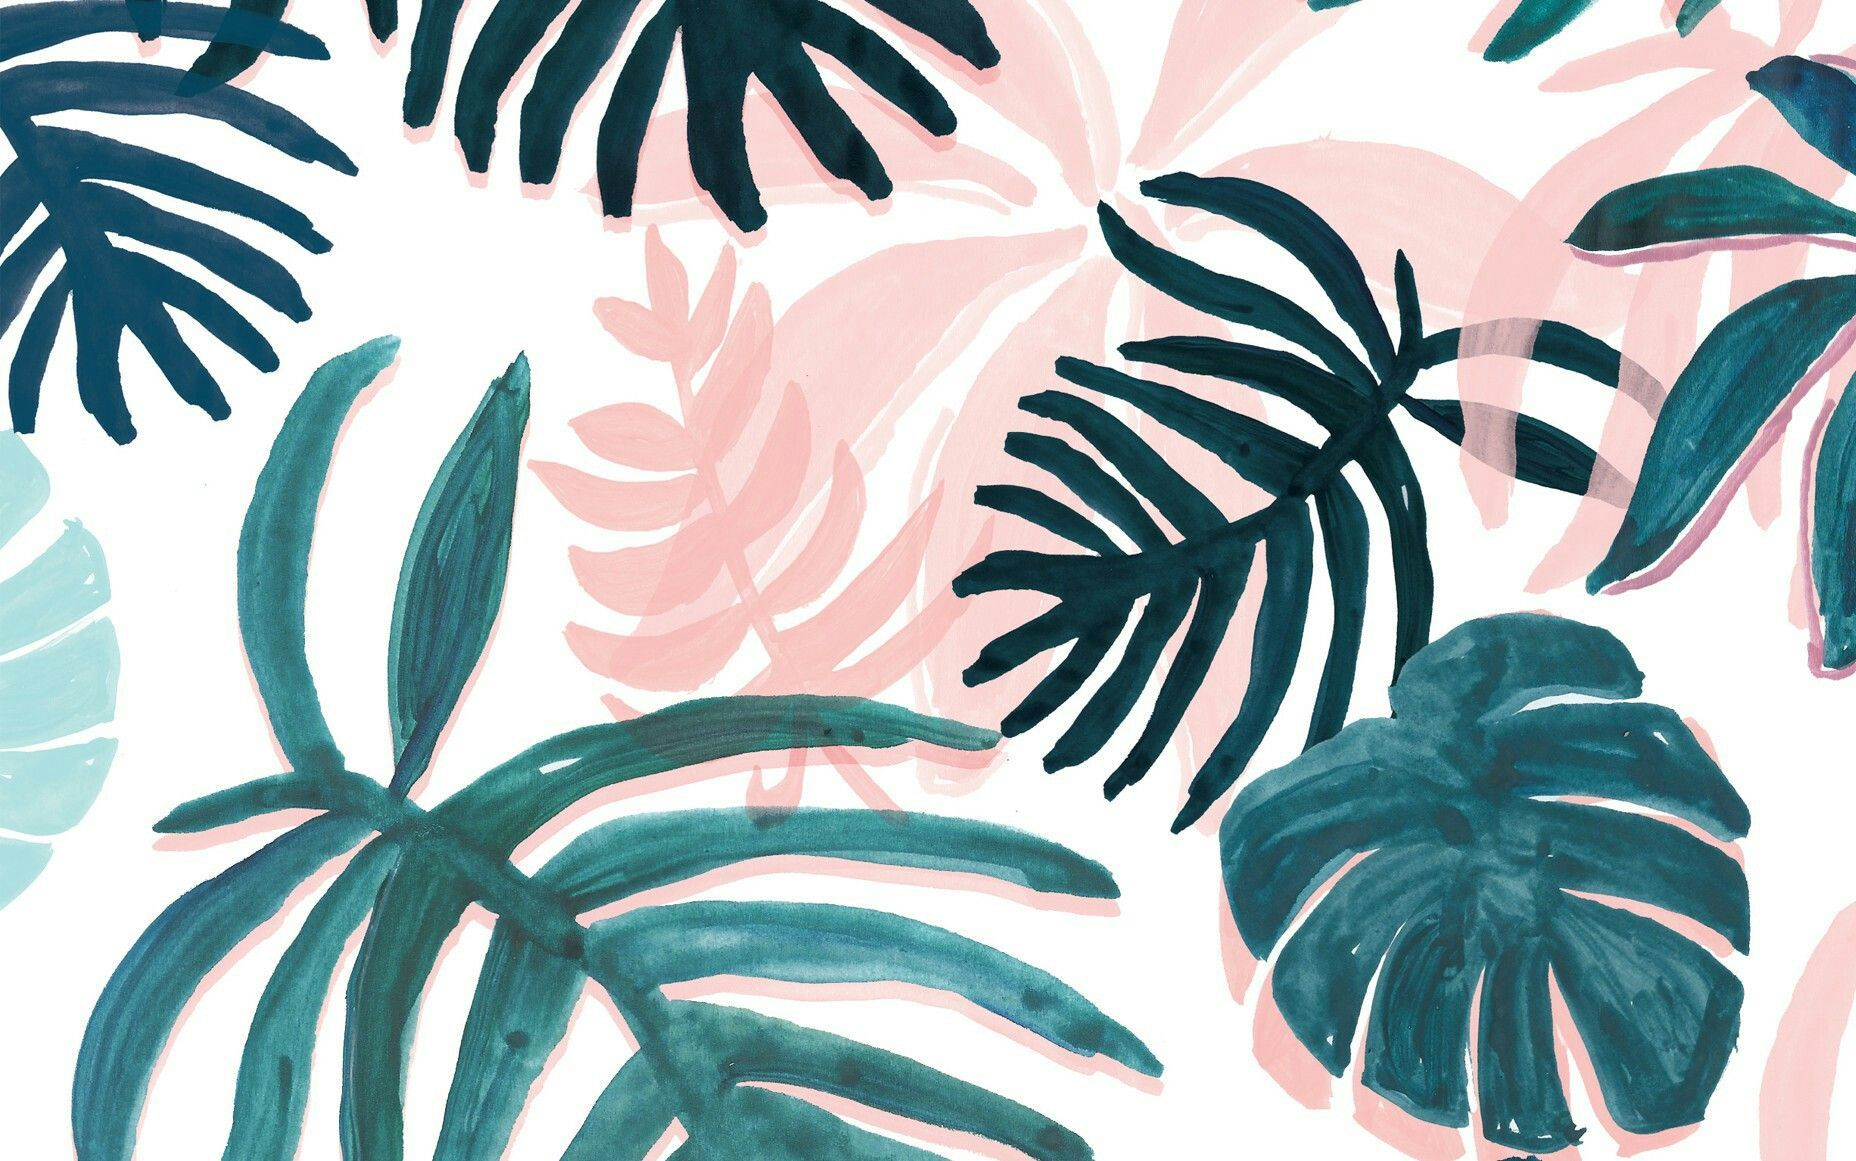 Cute Macbook Air Wallpapers Top Free Cute Macbook Air Backgrounds Wallpaperaccess